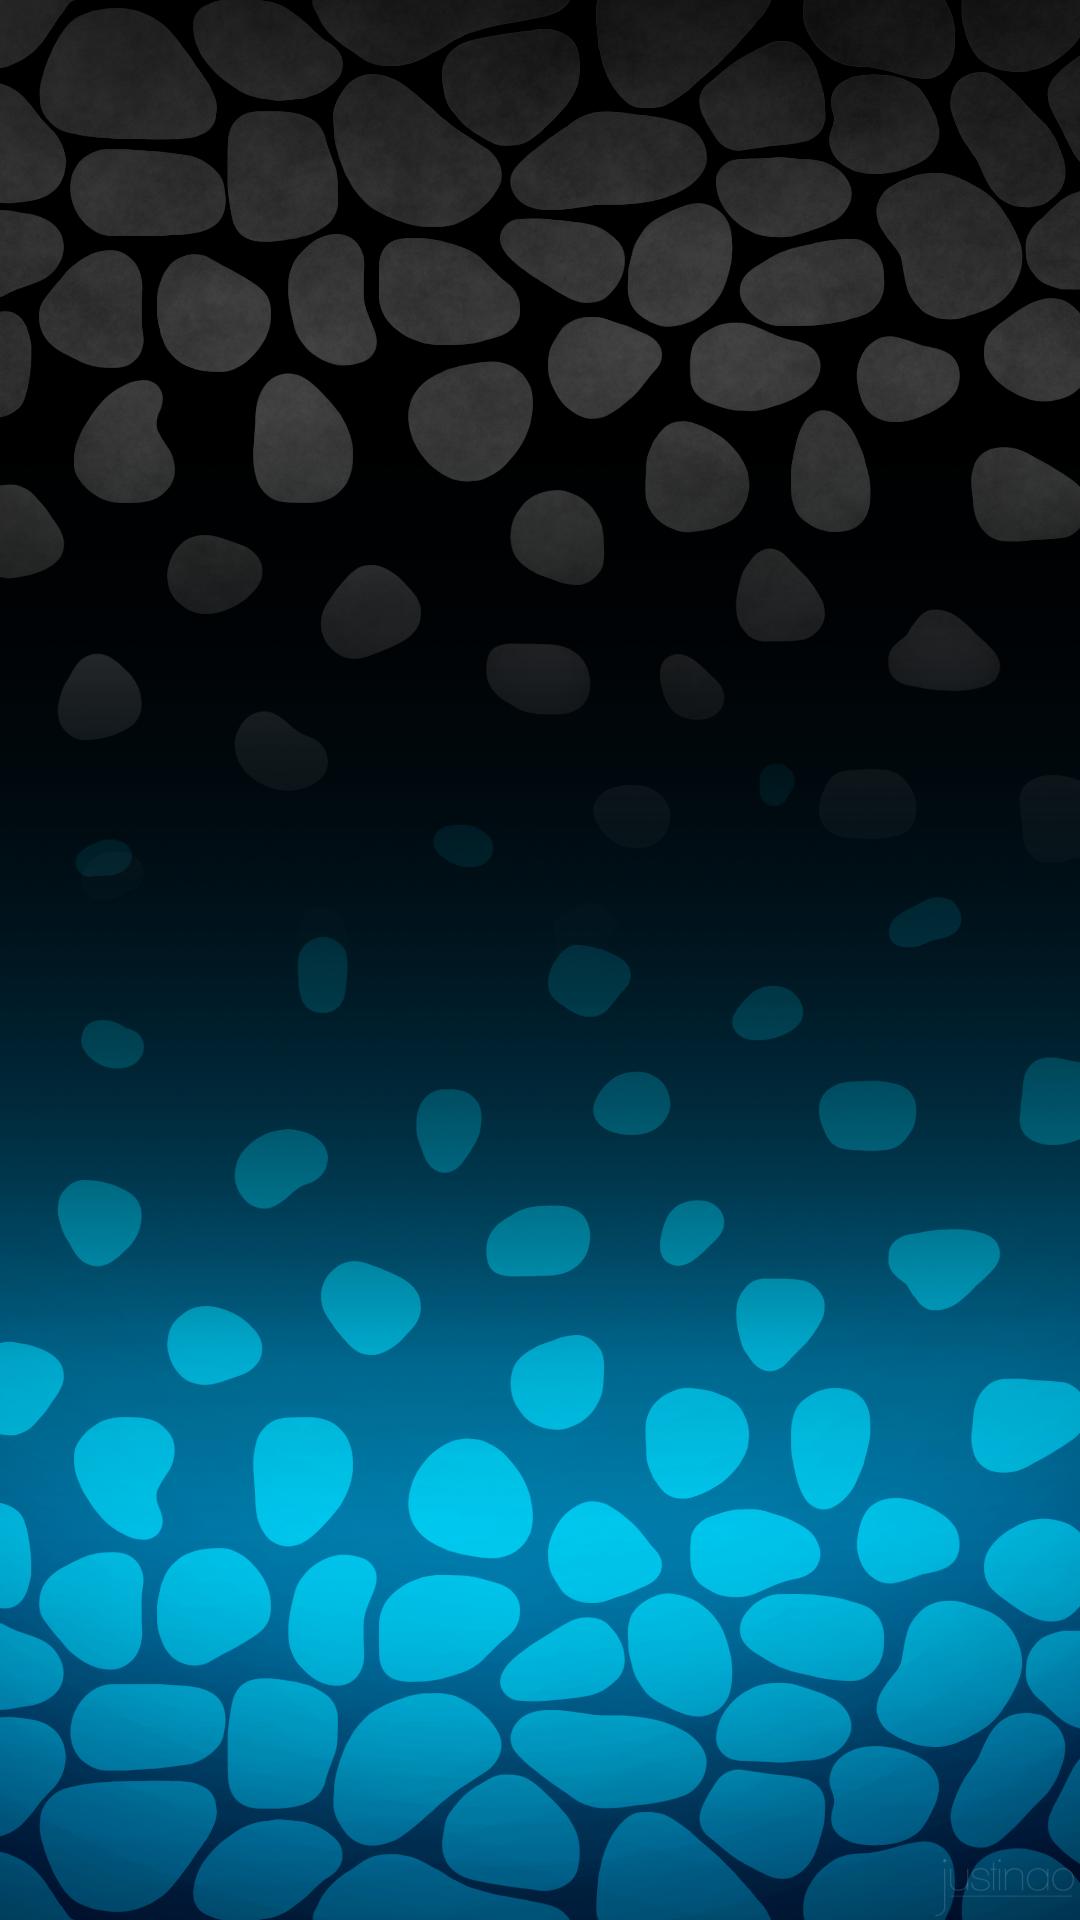 Amazing Wallpaper Mobile Screen - 32b28eb2e2c4a1857d62d7cea6e7b82f  Snapshot_333518.png